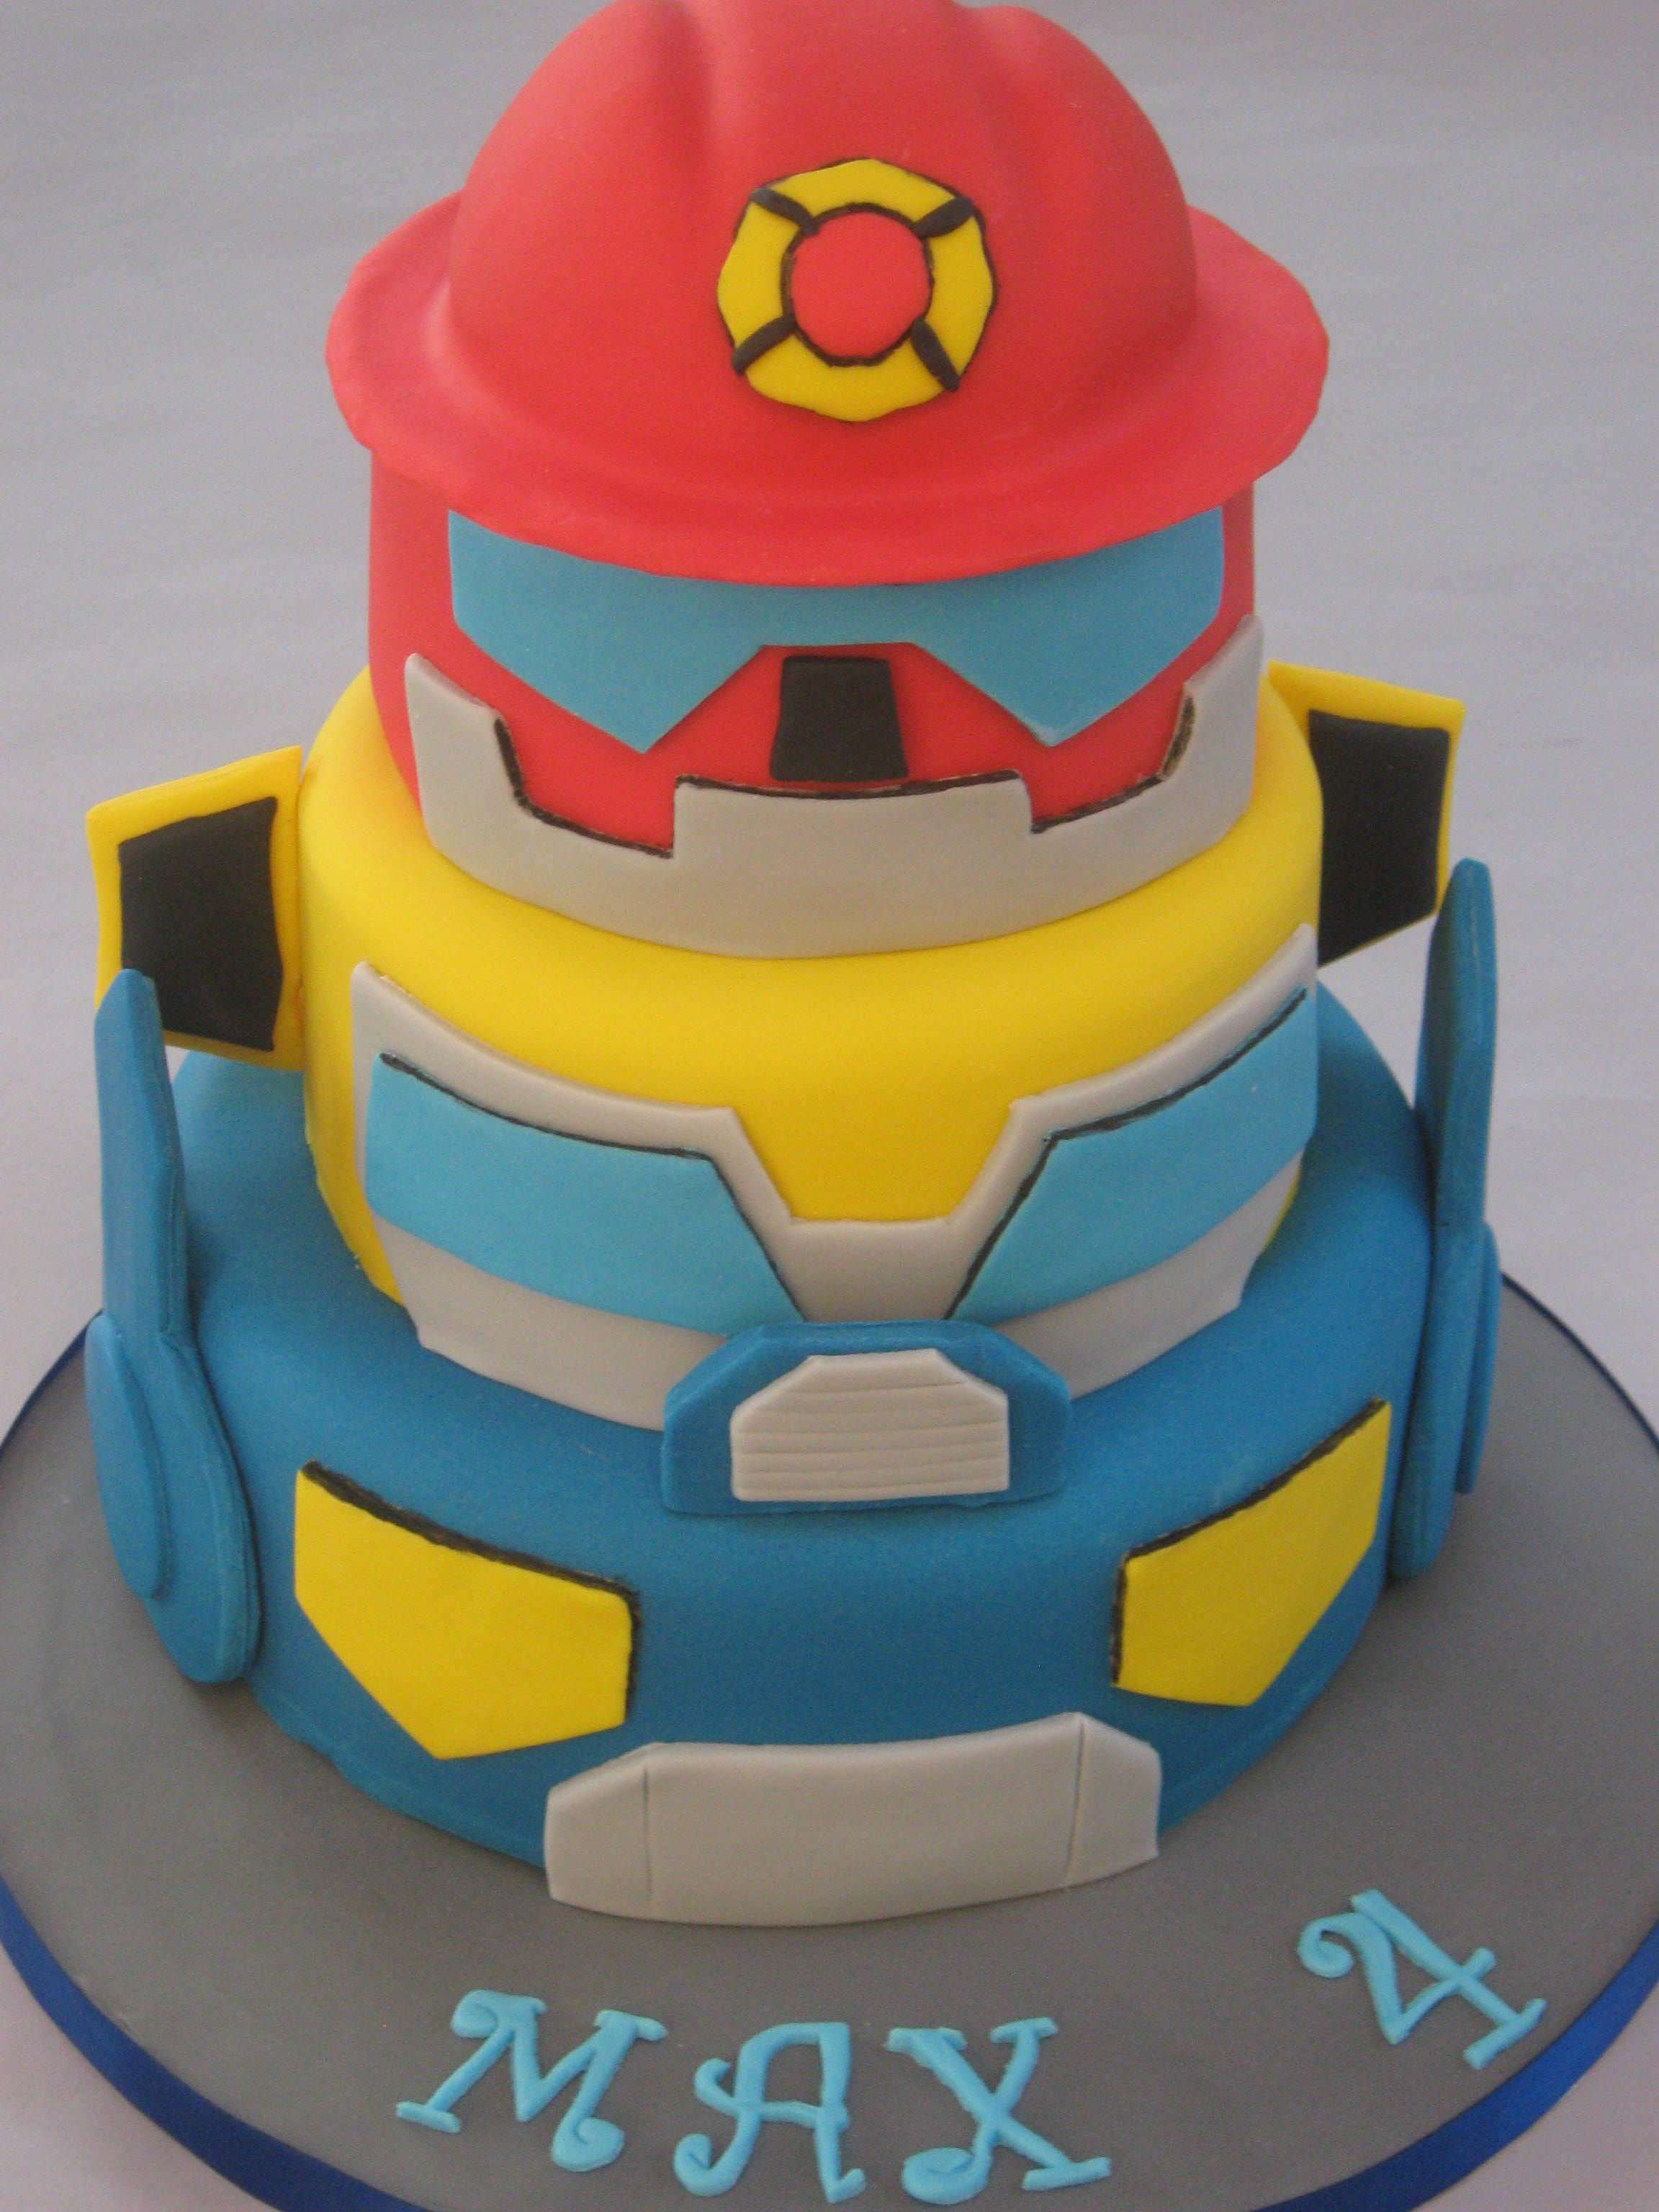 Pleasing Three Tiered Chocolate And Vanilla Sponge Rescue Bot Cake Funny Birthday Cards Online Alyptdamsfinfo